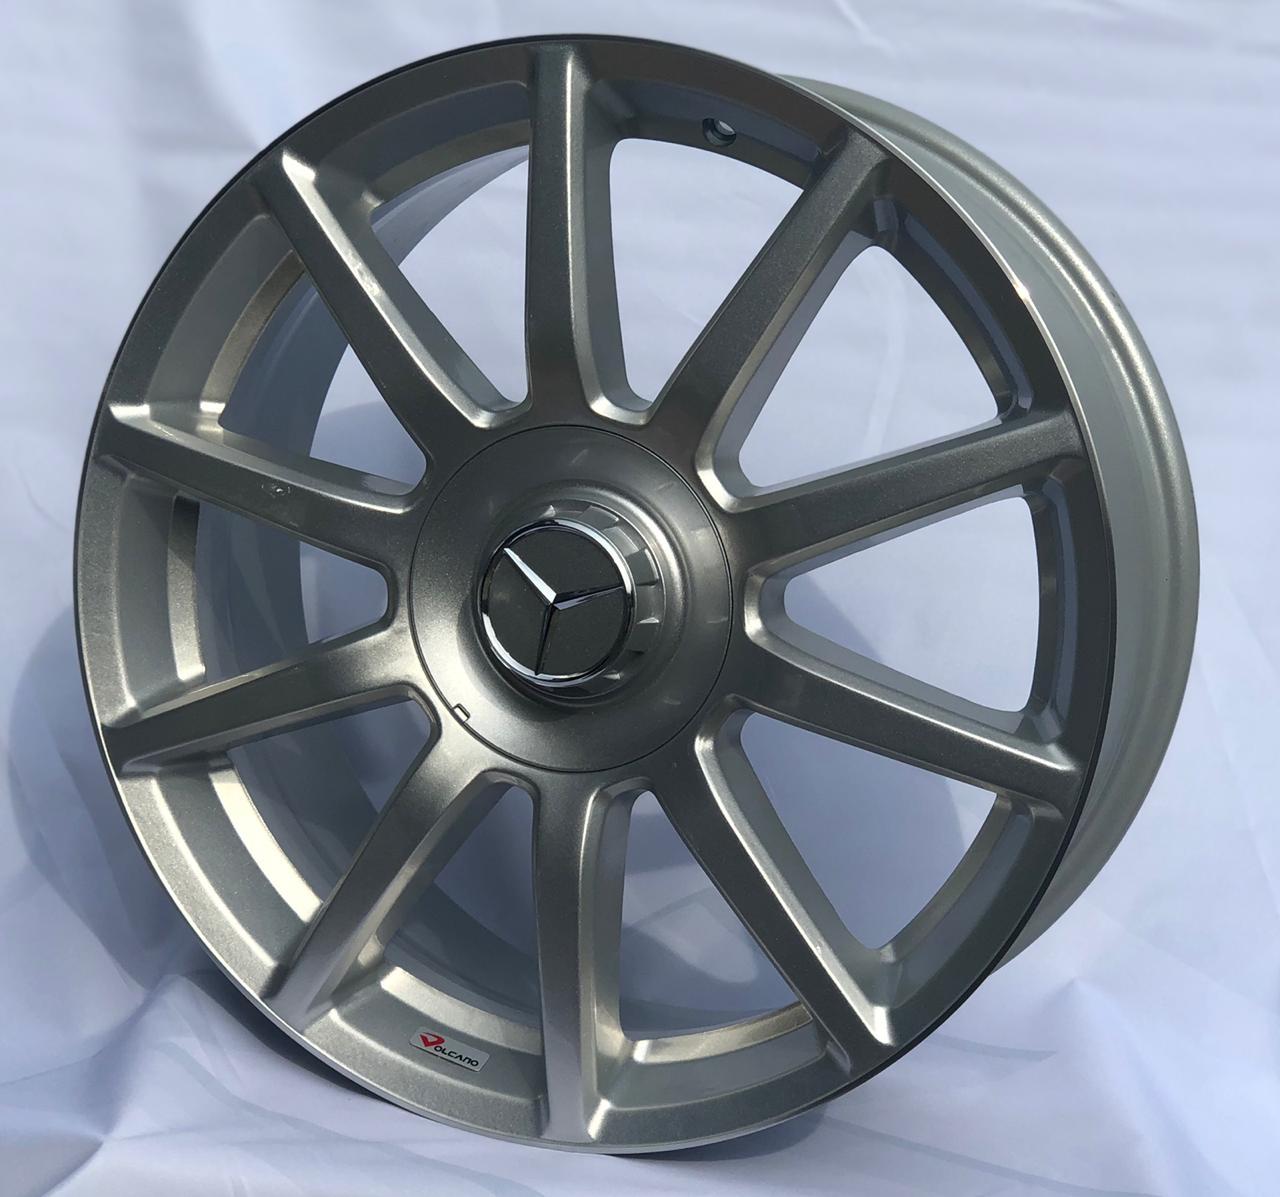 kit 4 Rodas Aro 18x7 Daimler Volcano 4x100/114,3 Prata